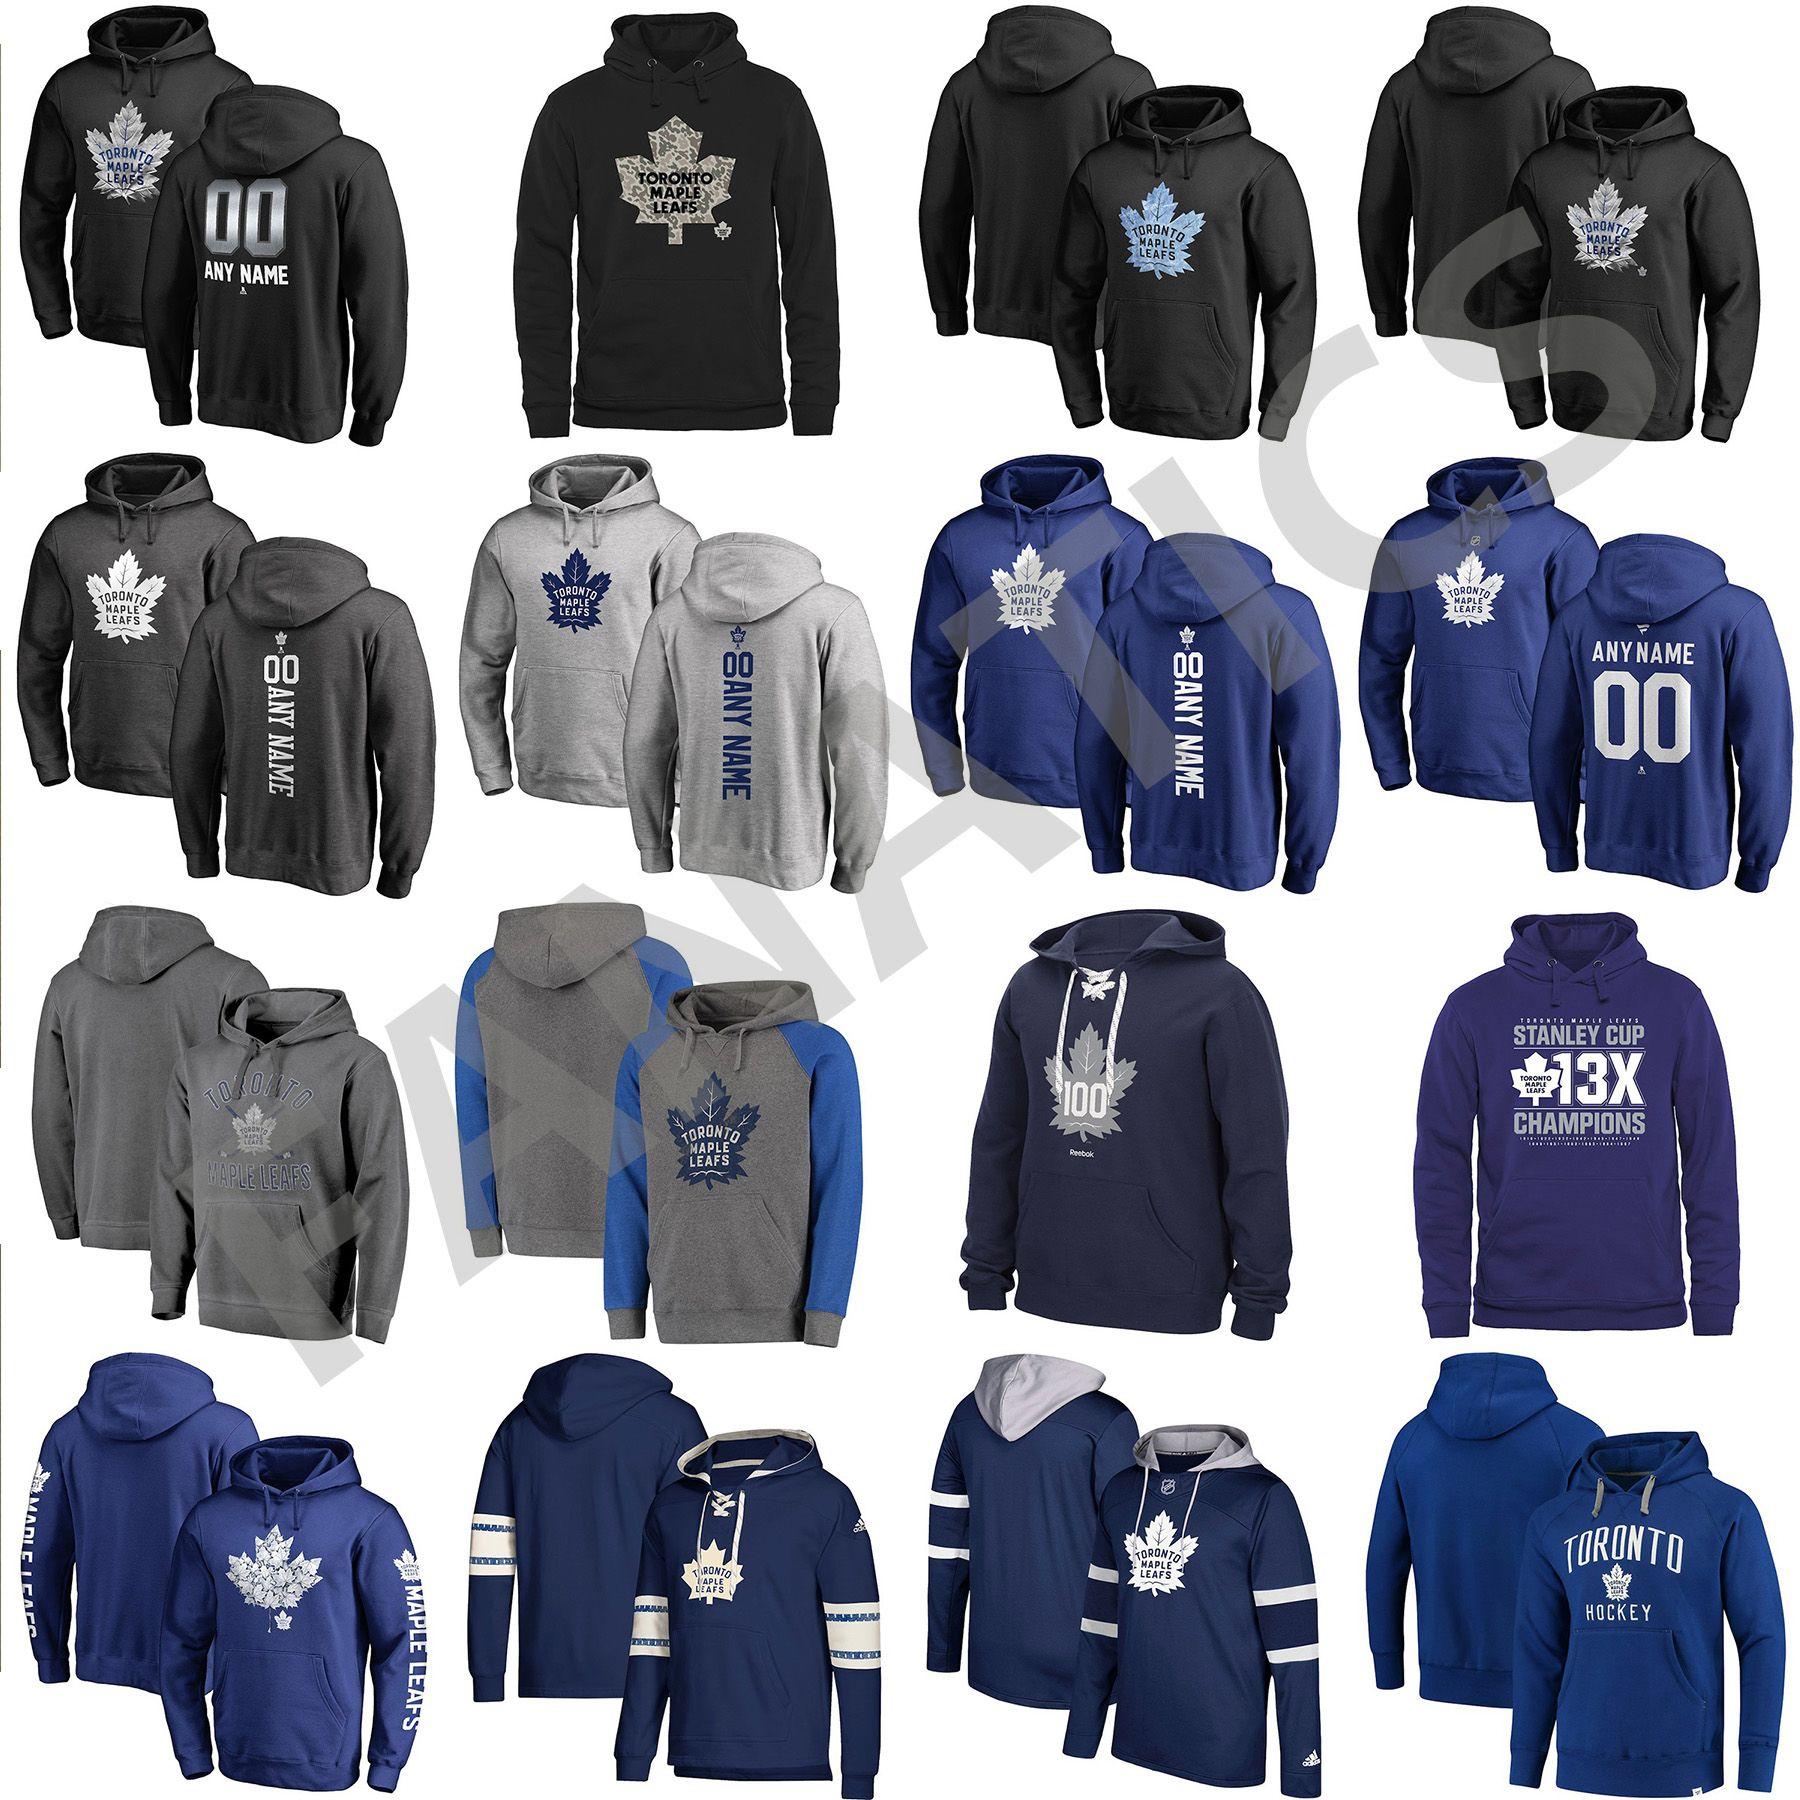 super popular 34129 5cb84 Cheap Custom Mens Womens Kids Toronto Maple Leafs Best Quality Embroidery  Logo Black Blue Gray Navy Hockey Hoodies with Any Name & Any No.